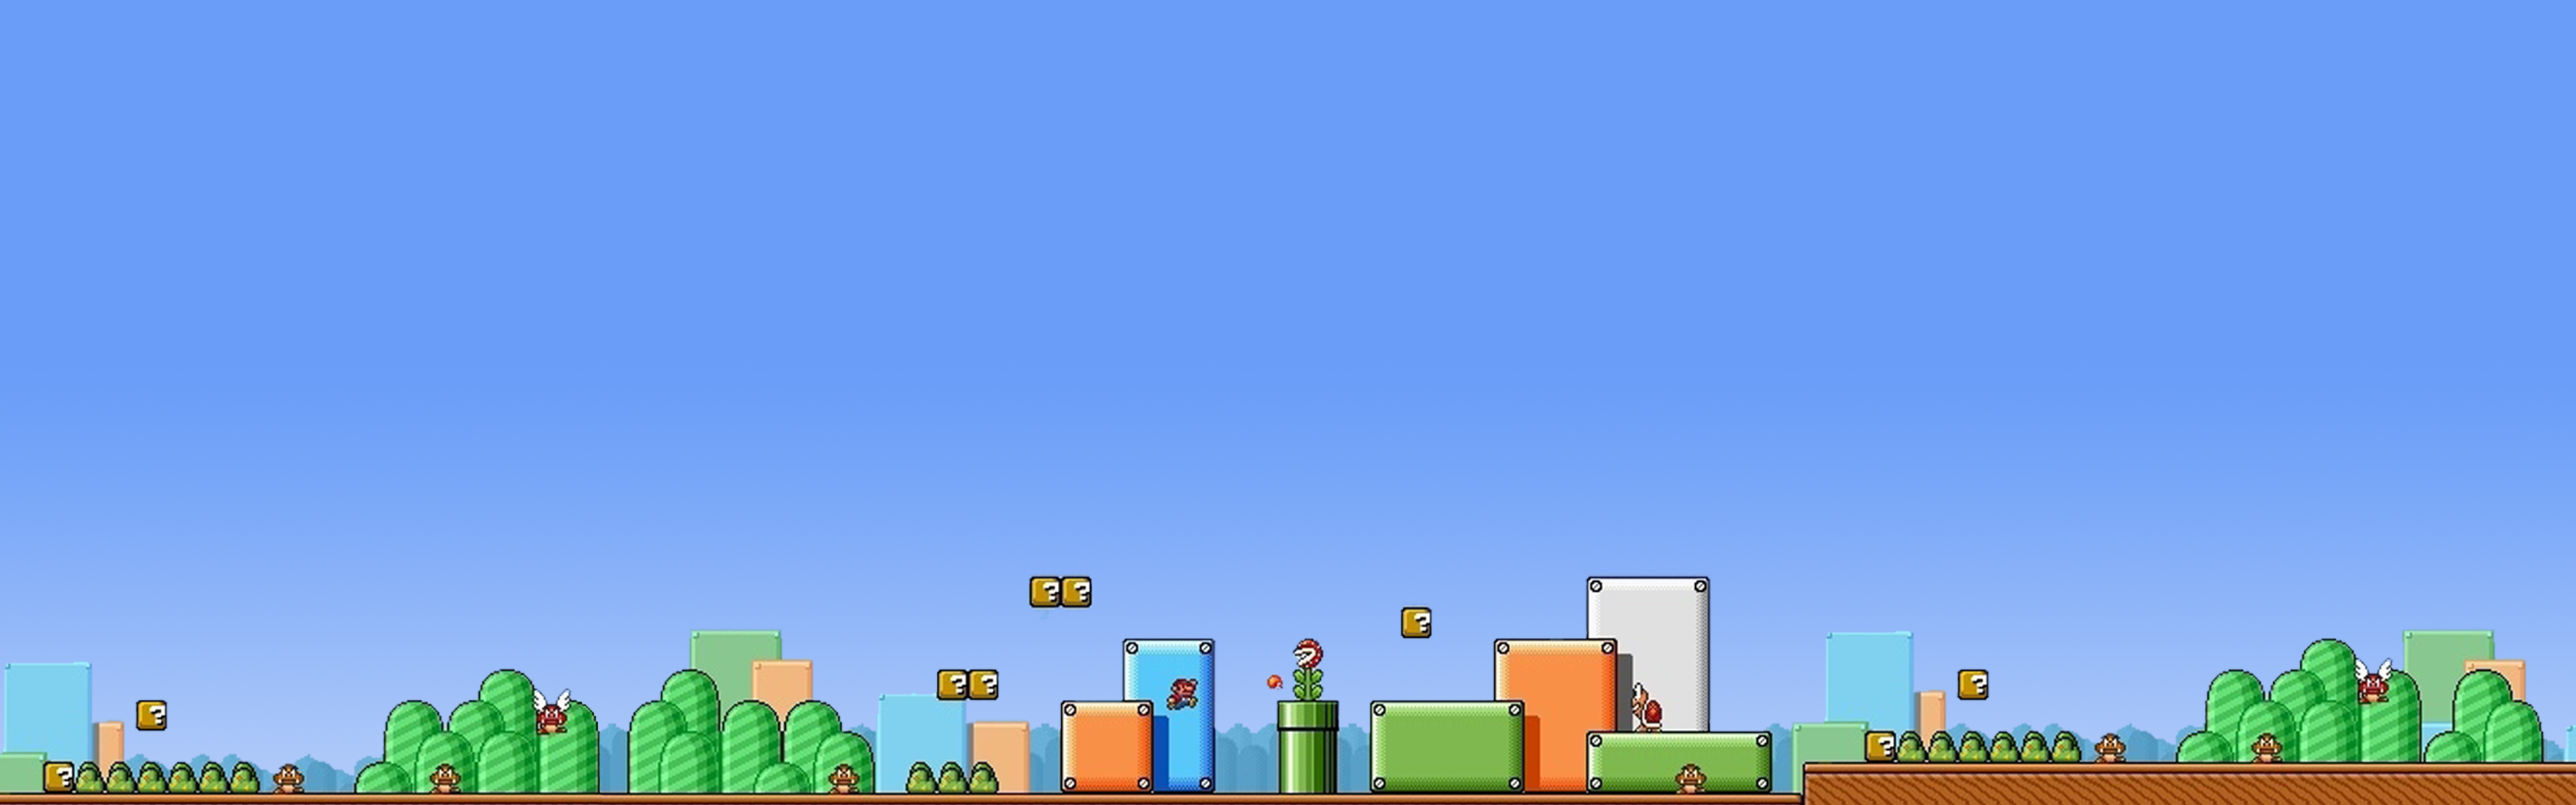 Super Mario Wallpaper by sylviaK86 Super Mario Wallpaper by sylviaK86